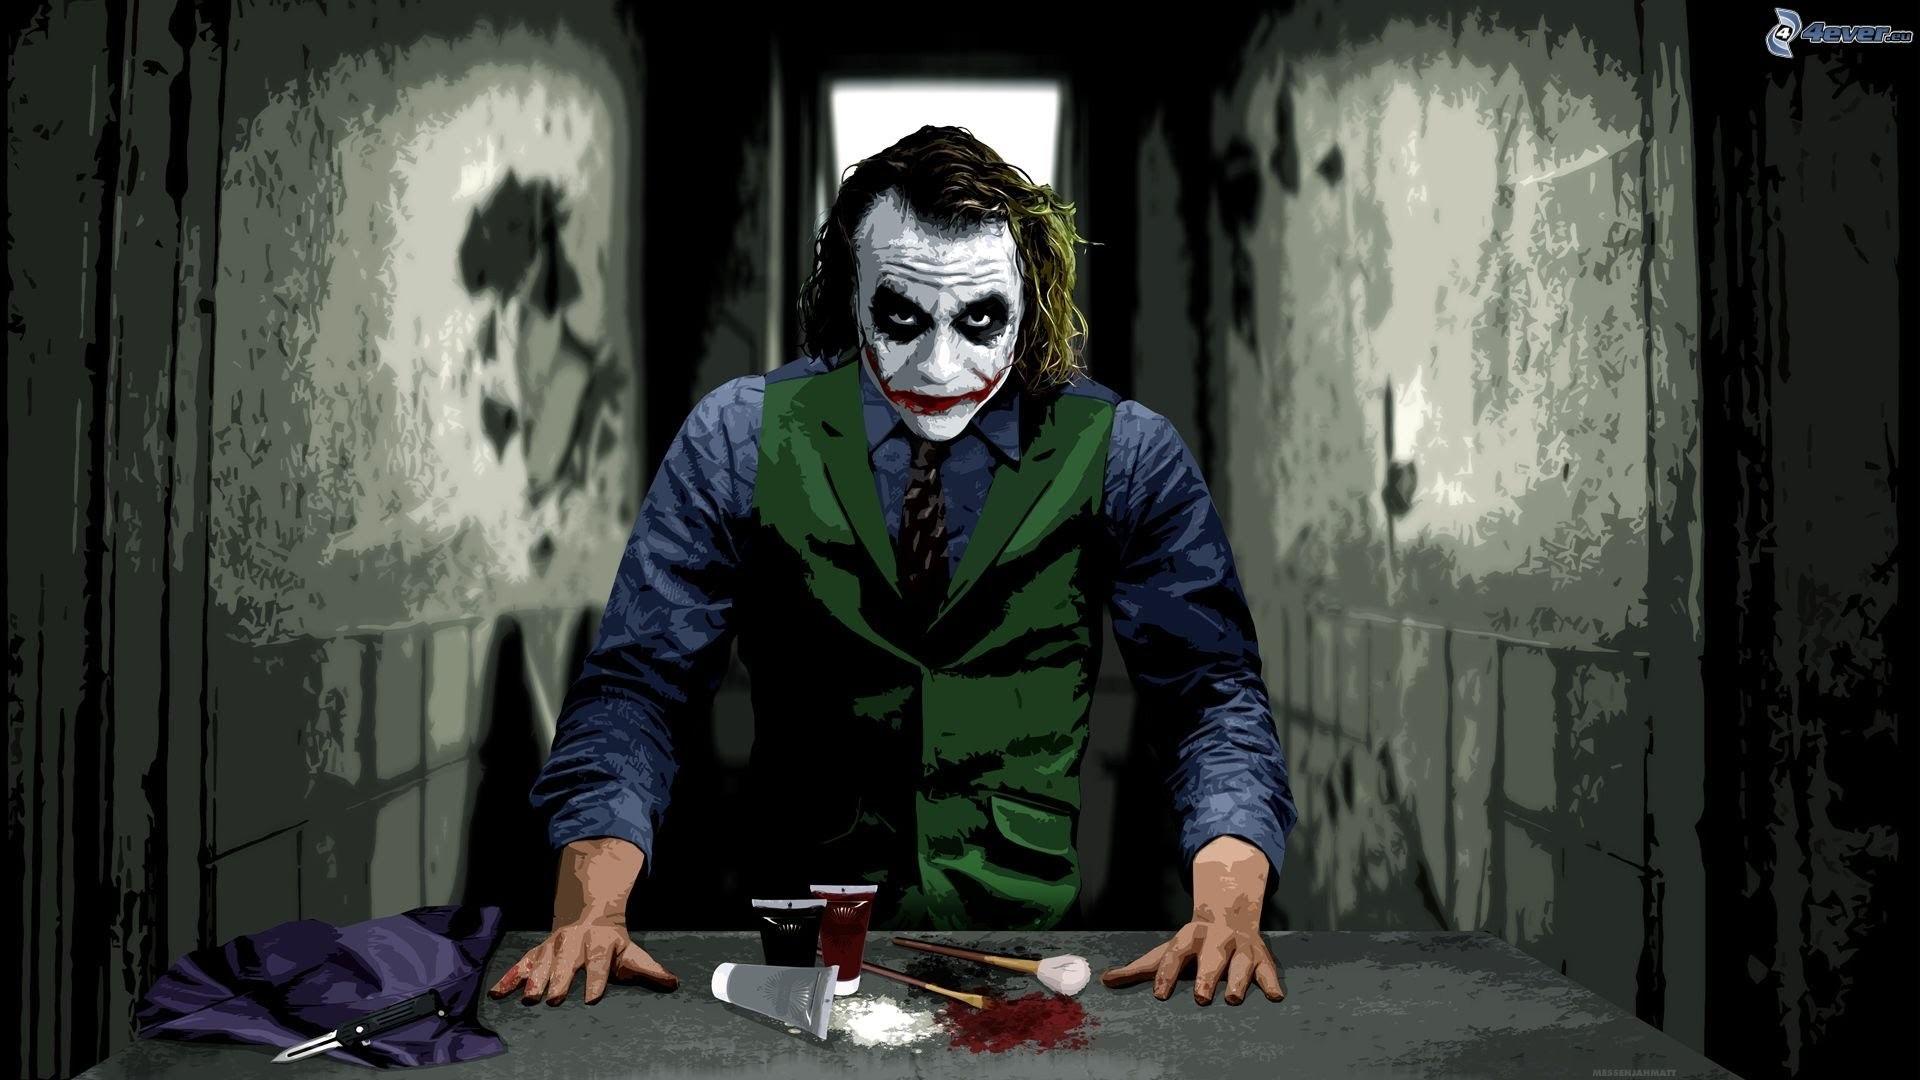 Joker Desktop Wallpaper Picture #n66rqv1f